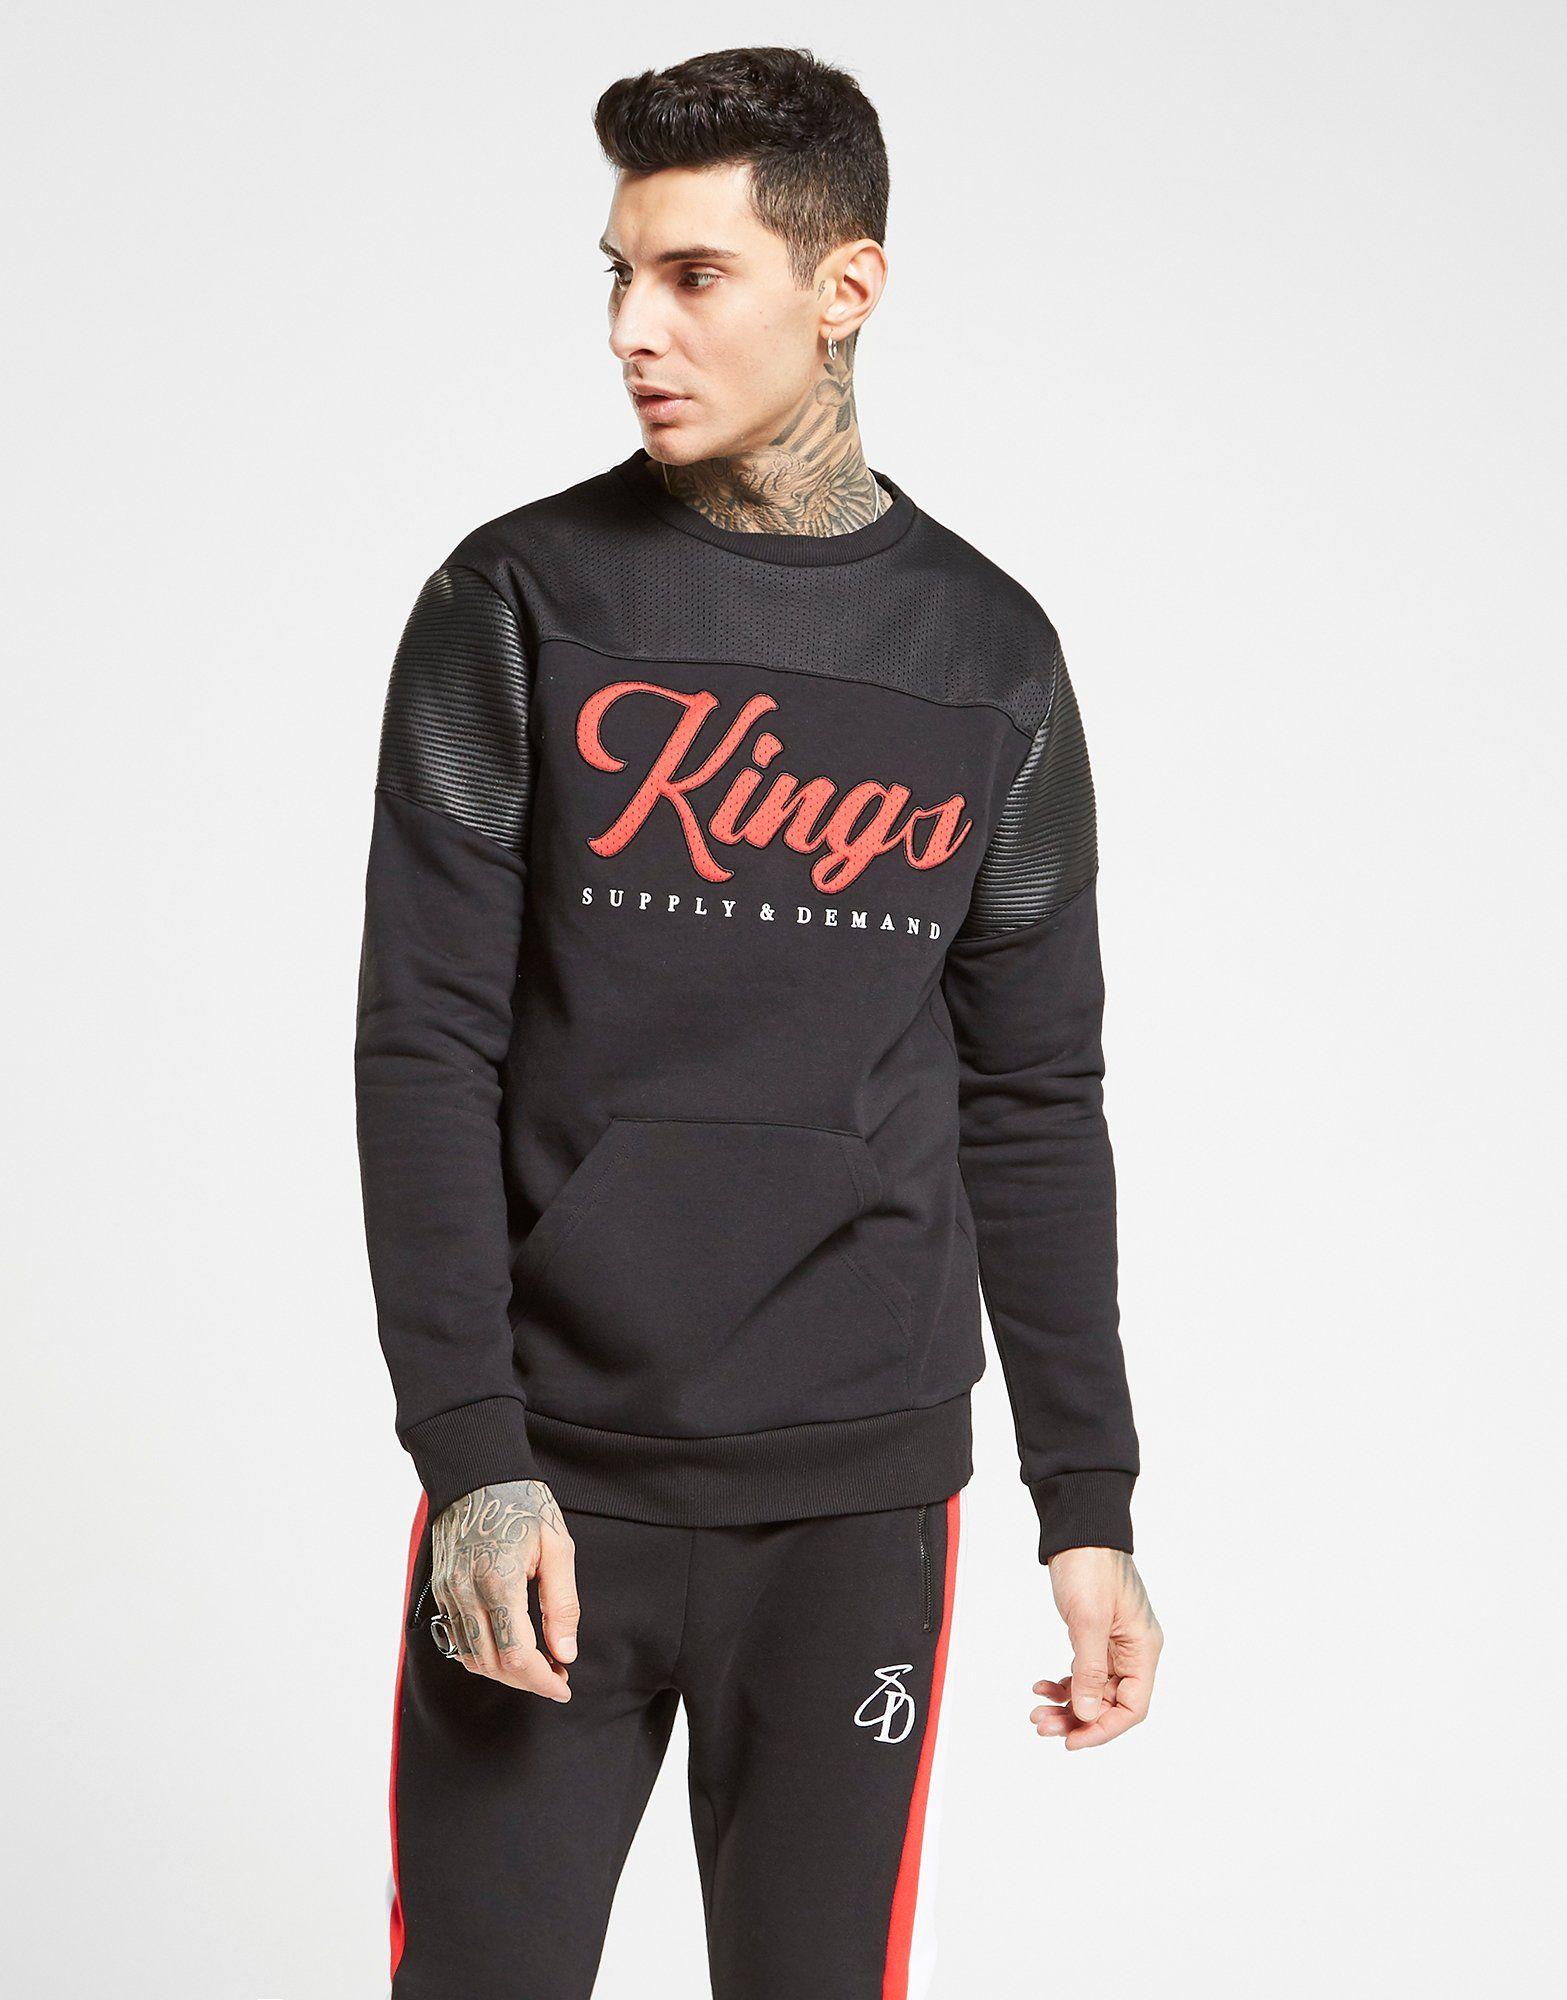 Supply & Demand Bowling Crew Sweatshirt